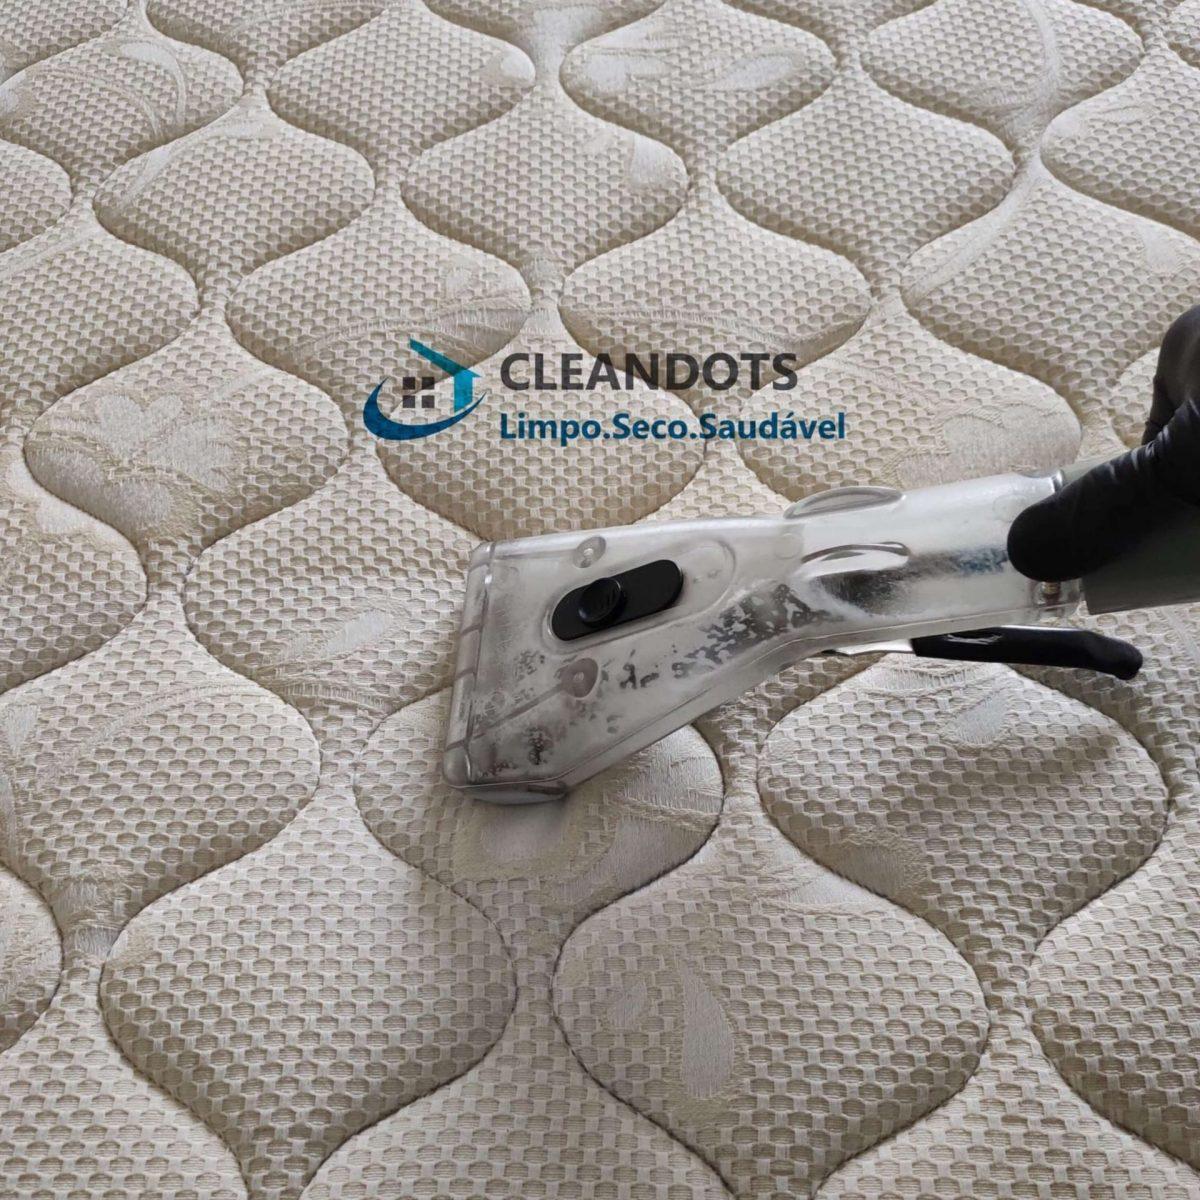 Cleandots limpeza de colchão